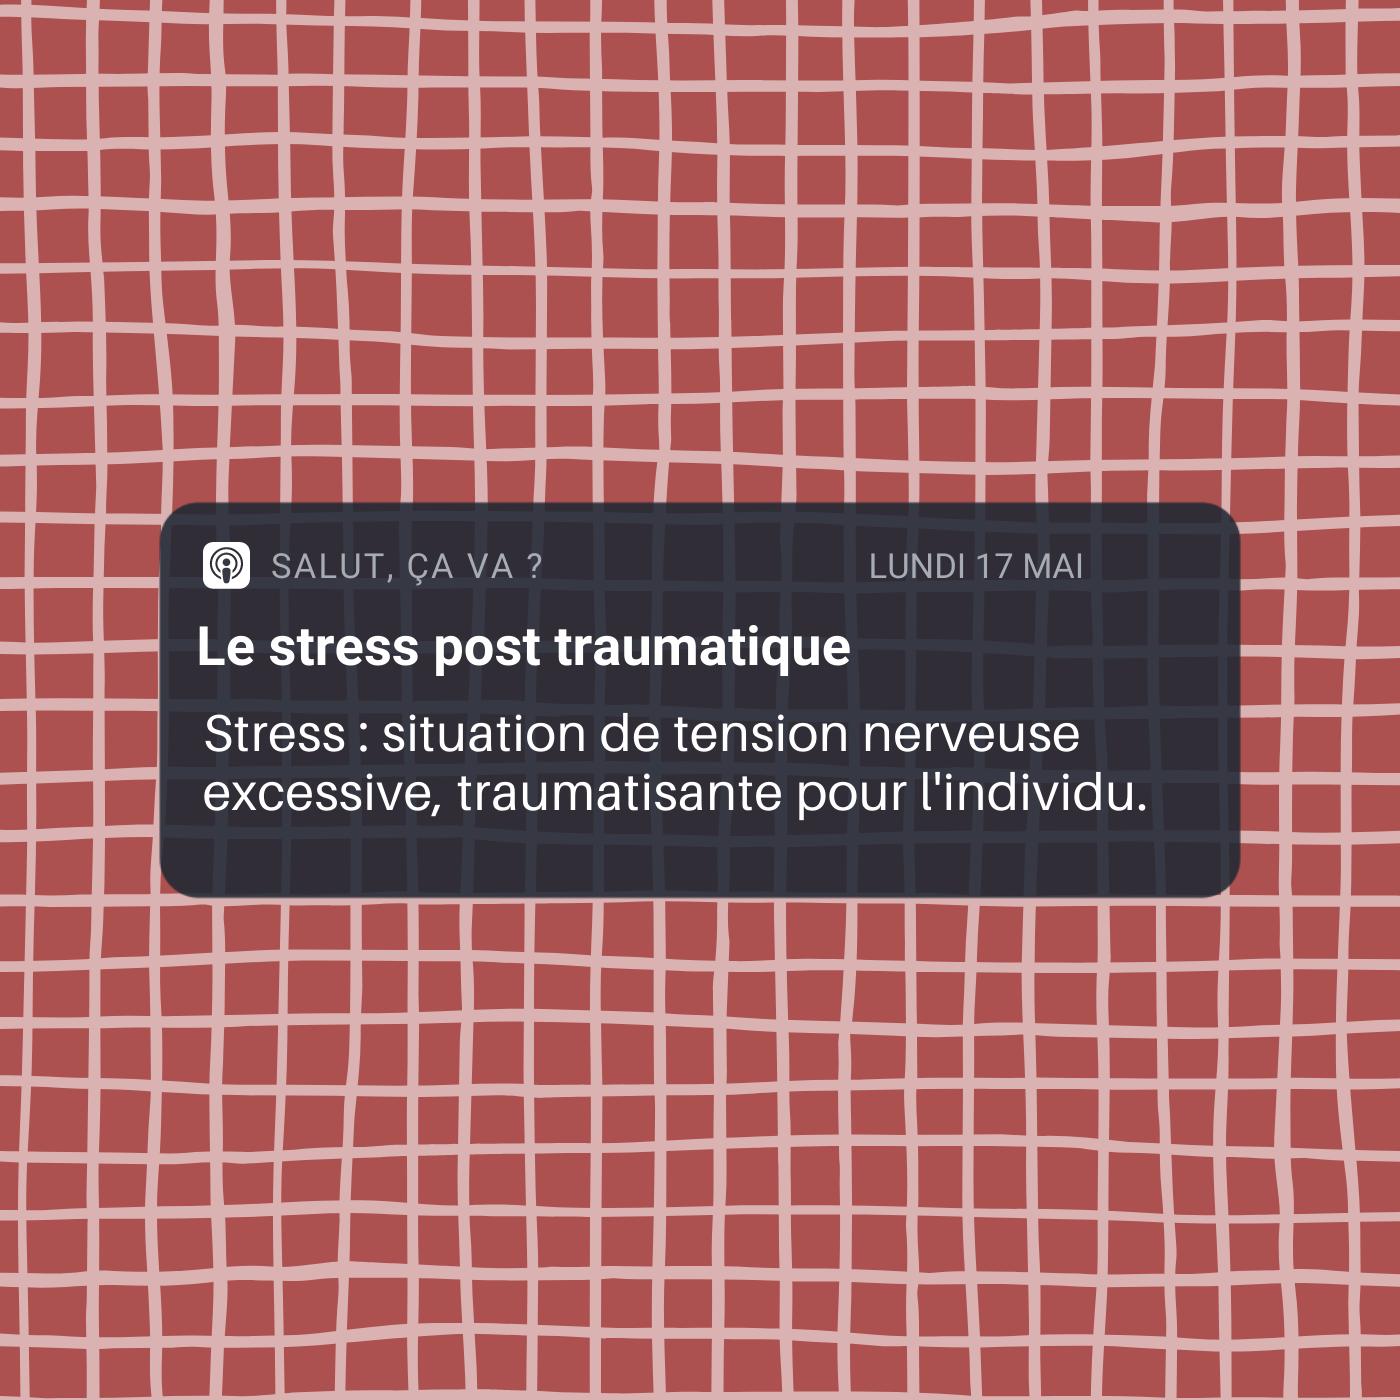 Le stress post traumatique